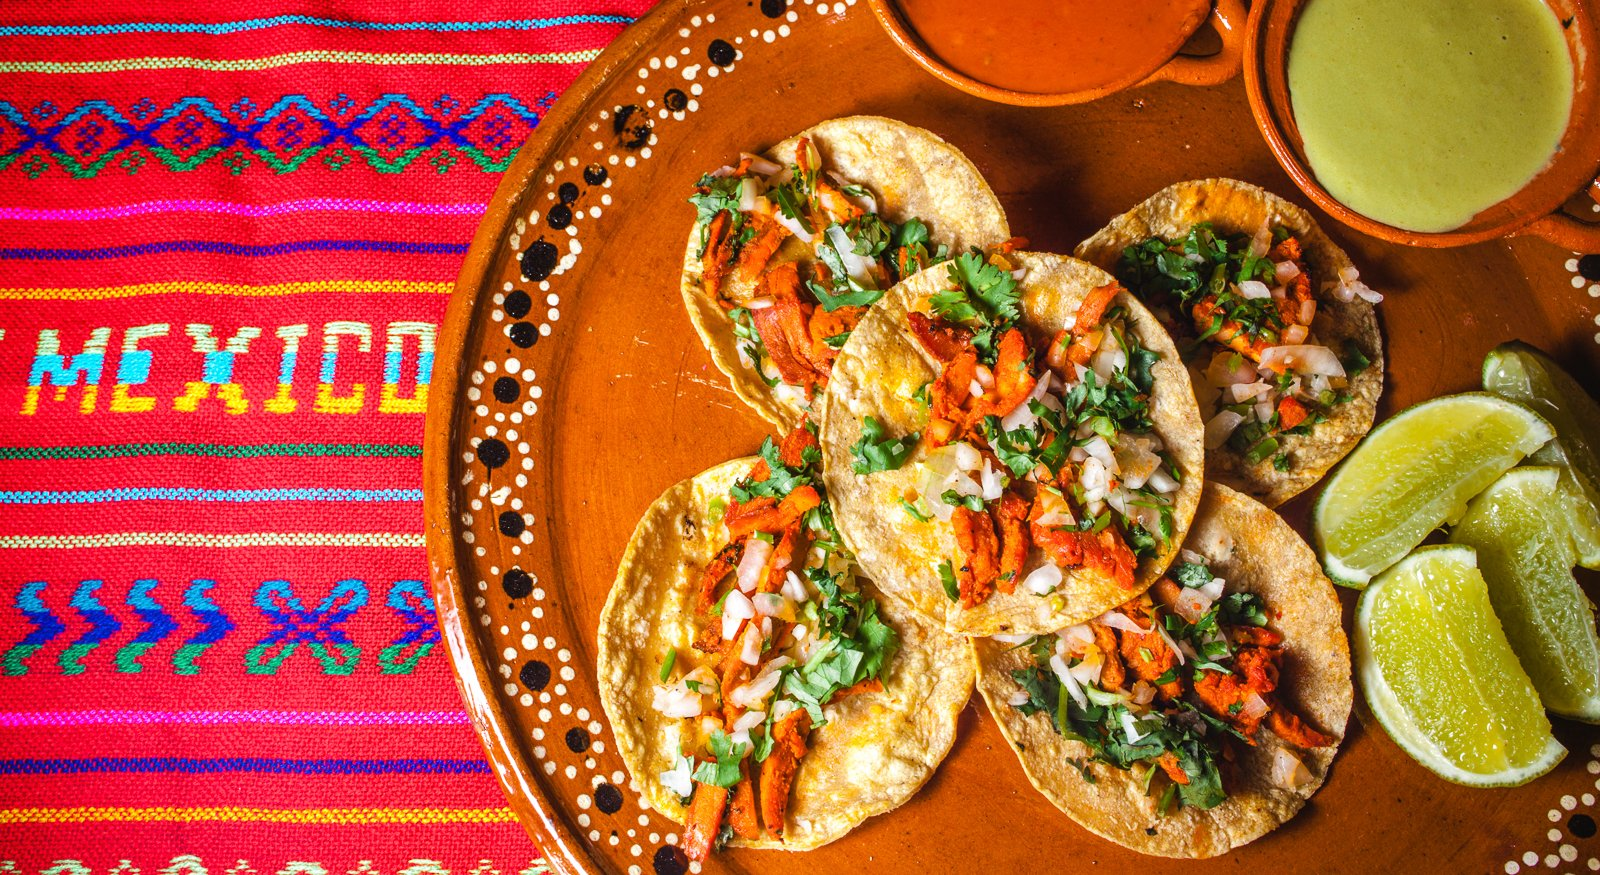 Best Restaurants In Playa Del Carmen A Guide For Foodies